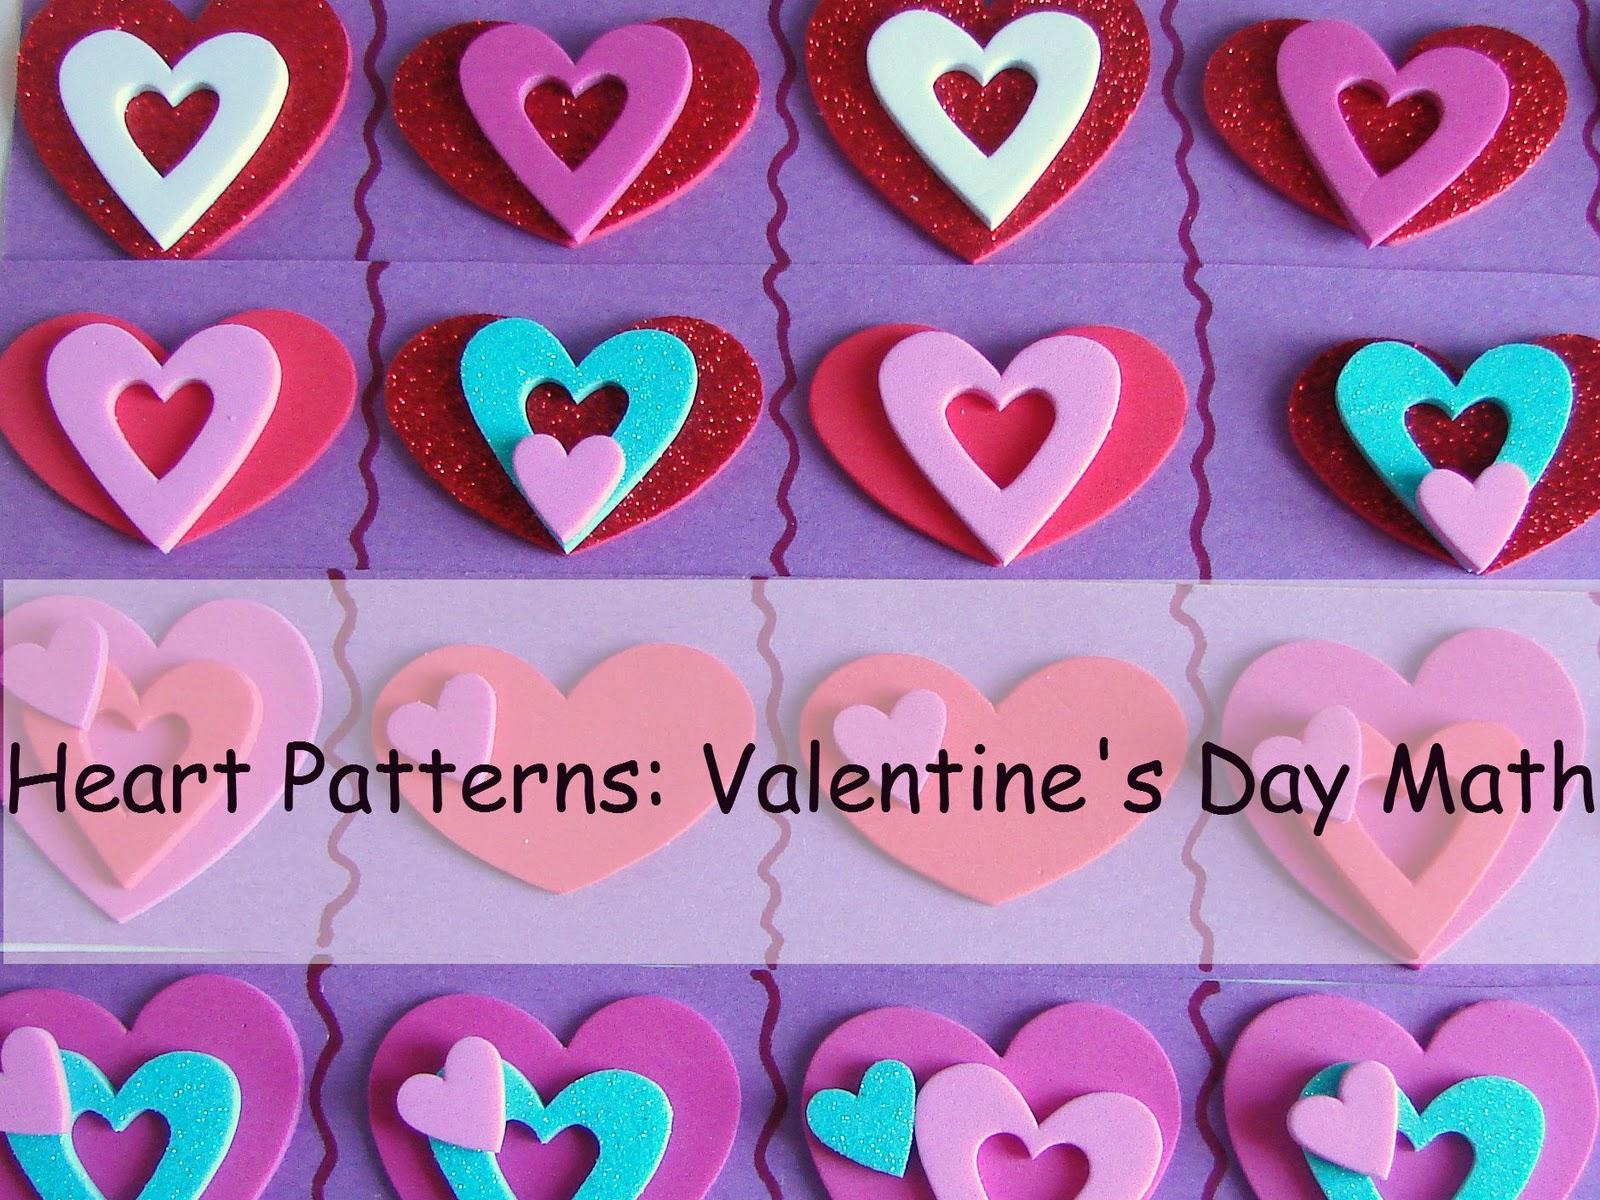 Childhood Beckons Heart Patterns A Valentine S Day Math Activity